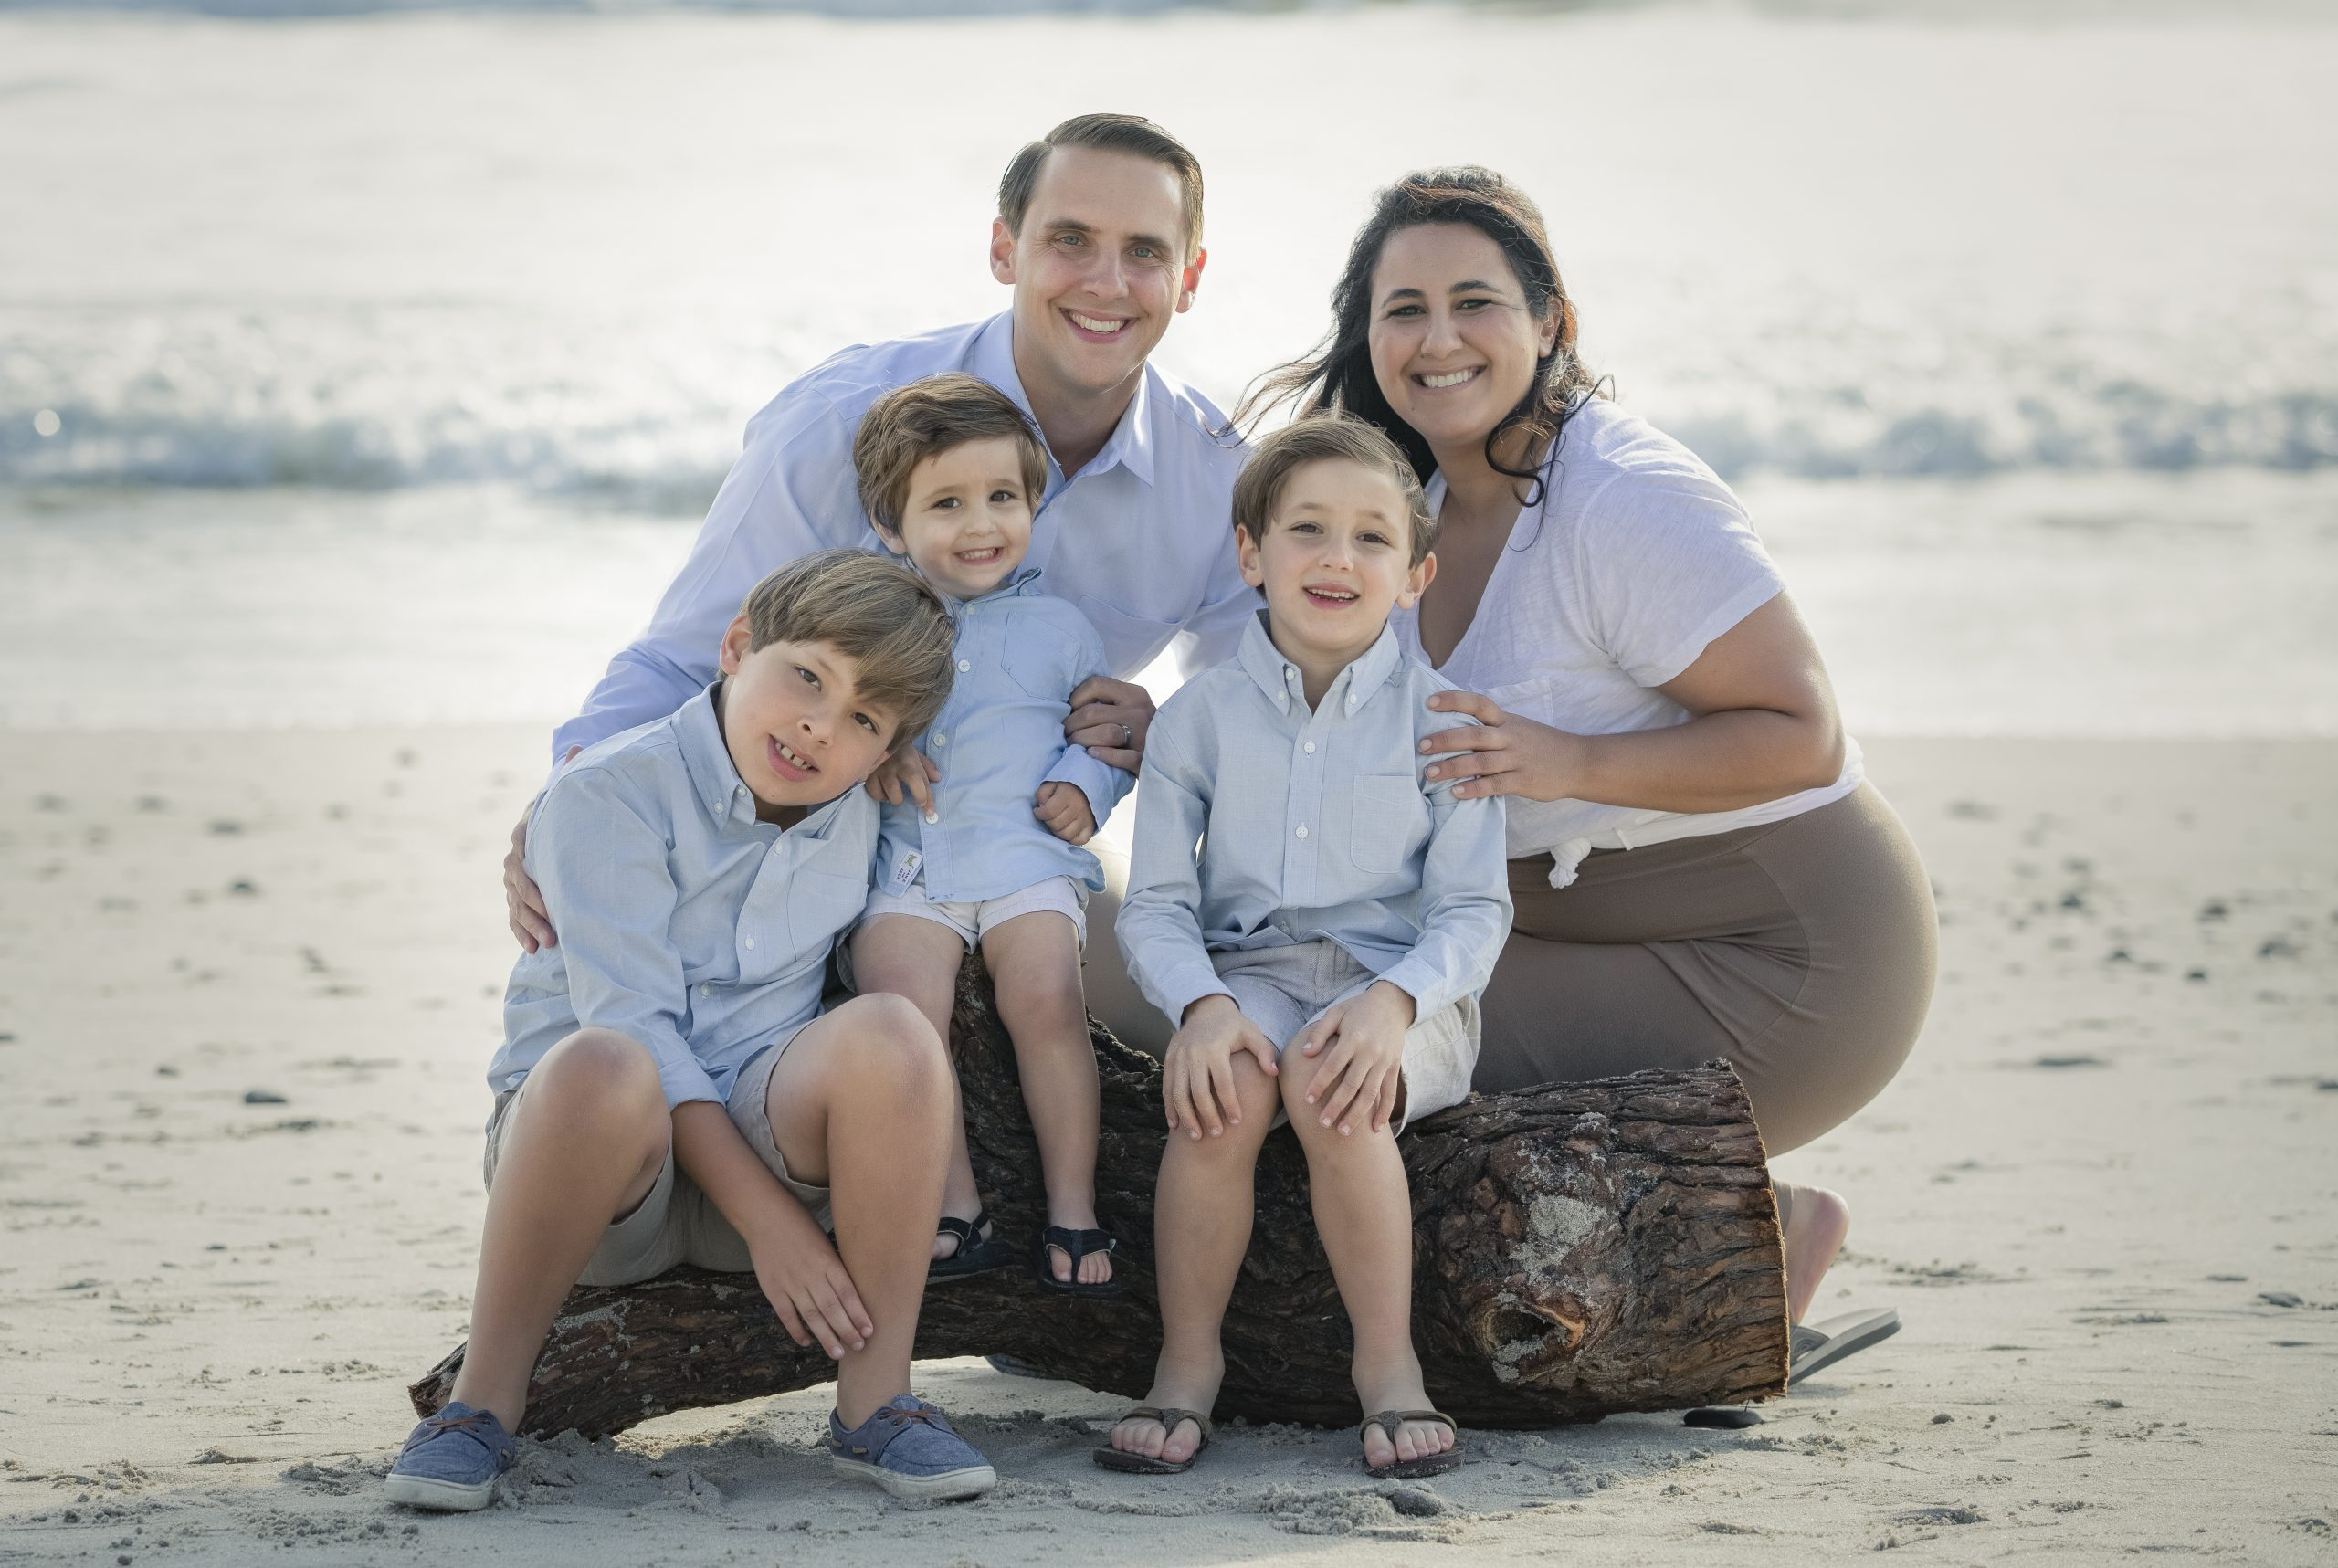 Corey & Dimyena With Children